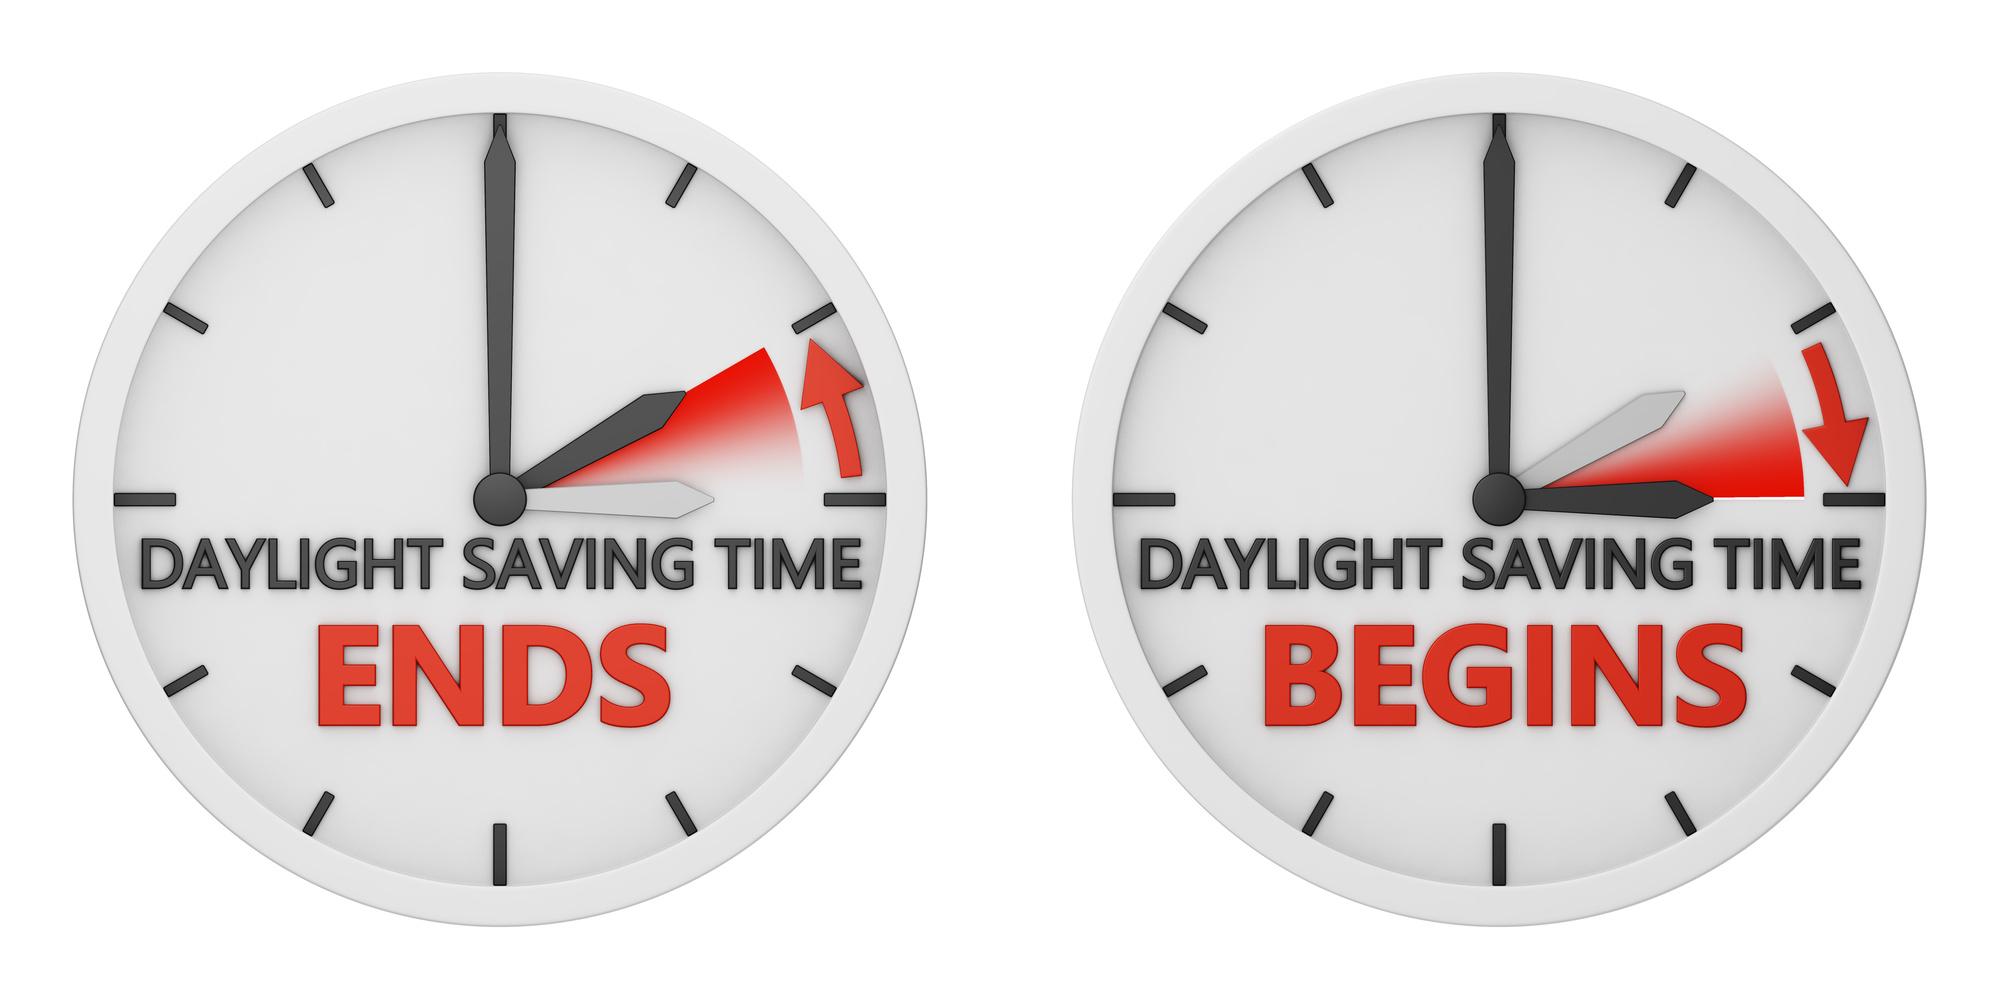 how to change daylight saving